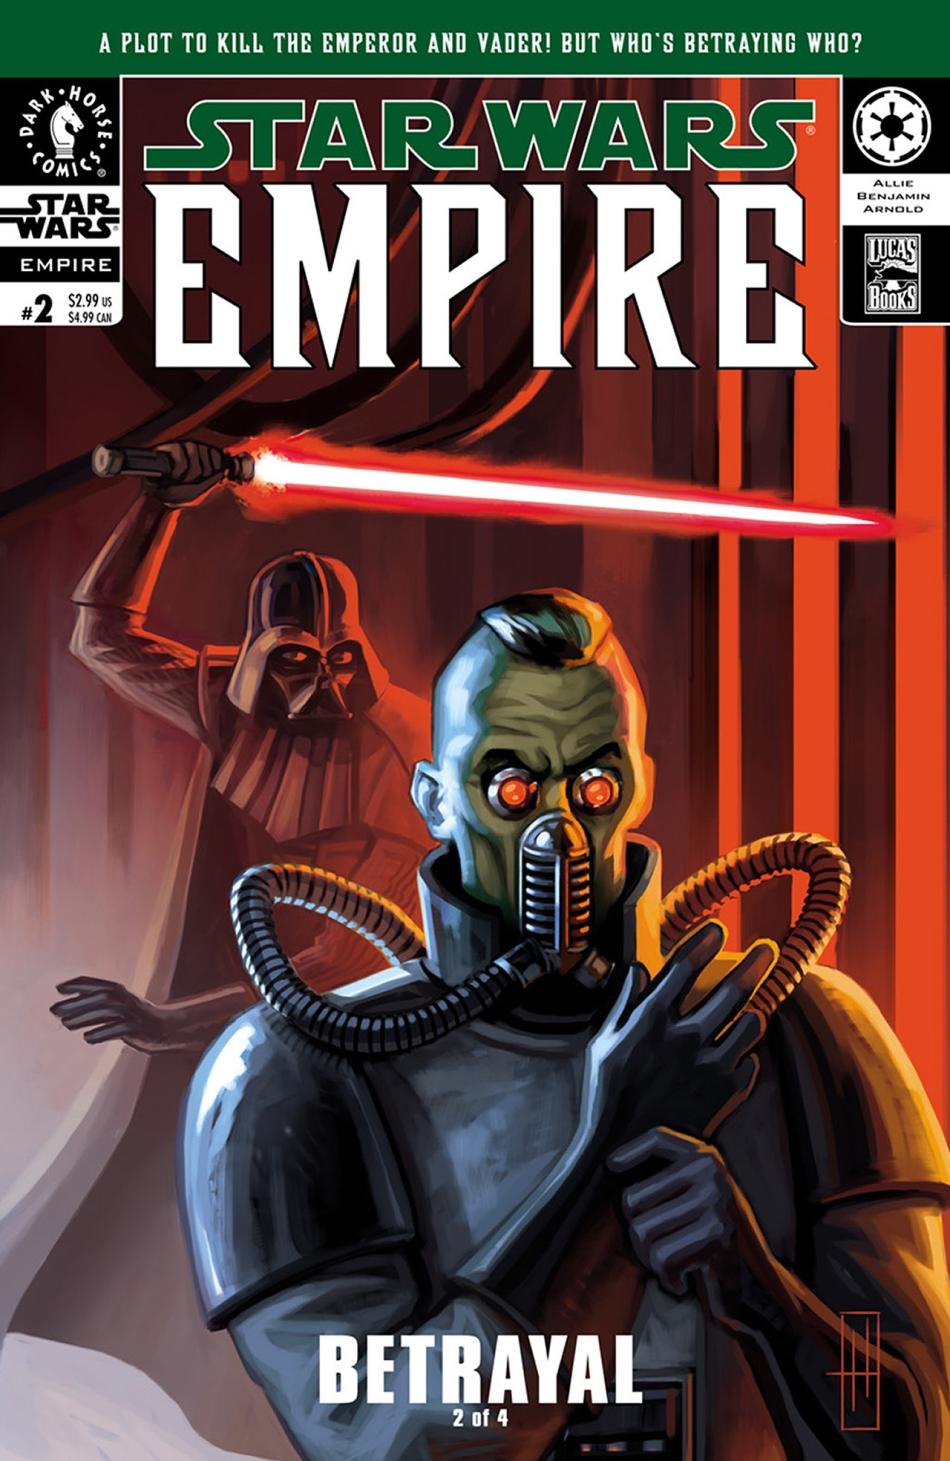 Empire #2: Betrayal, Part 2 (02.10.2002)